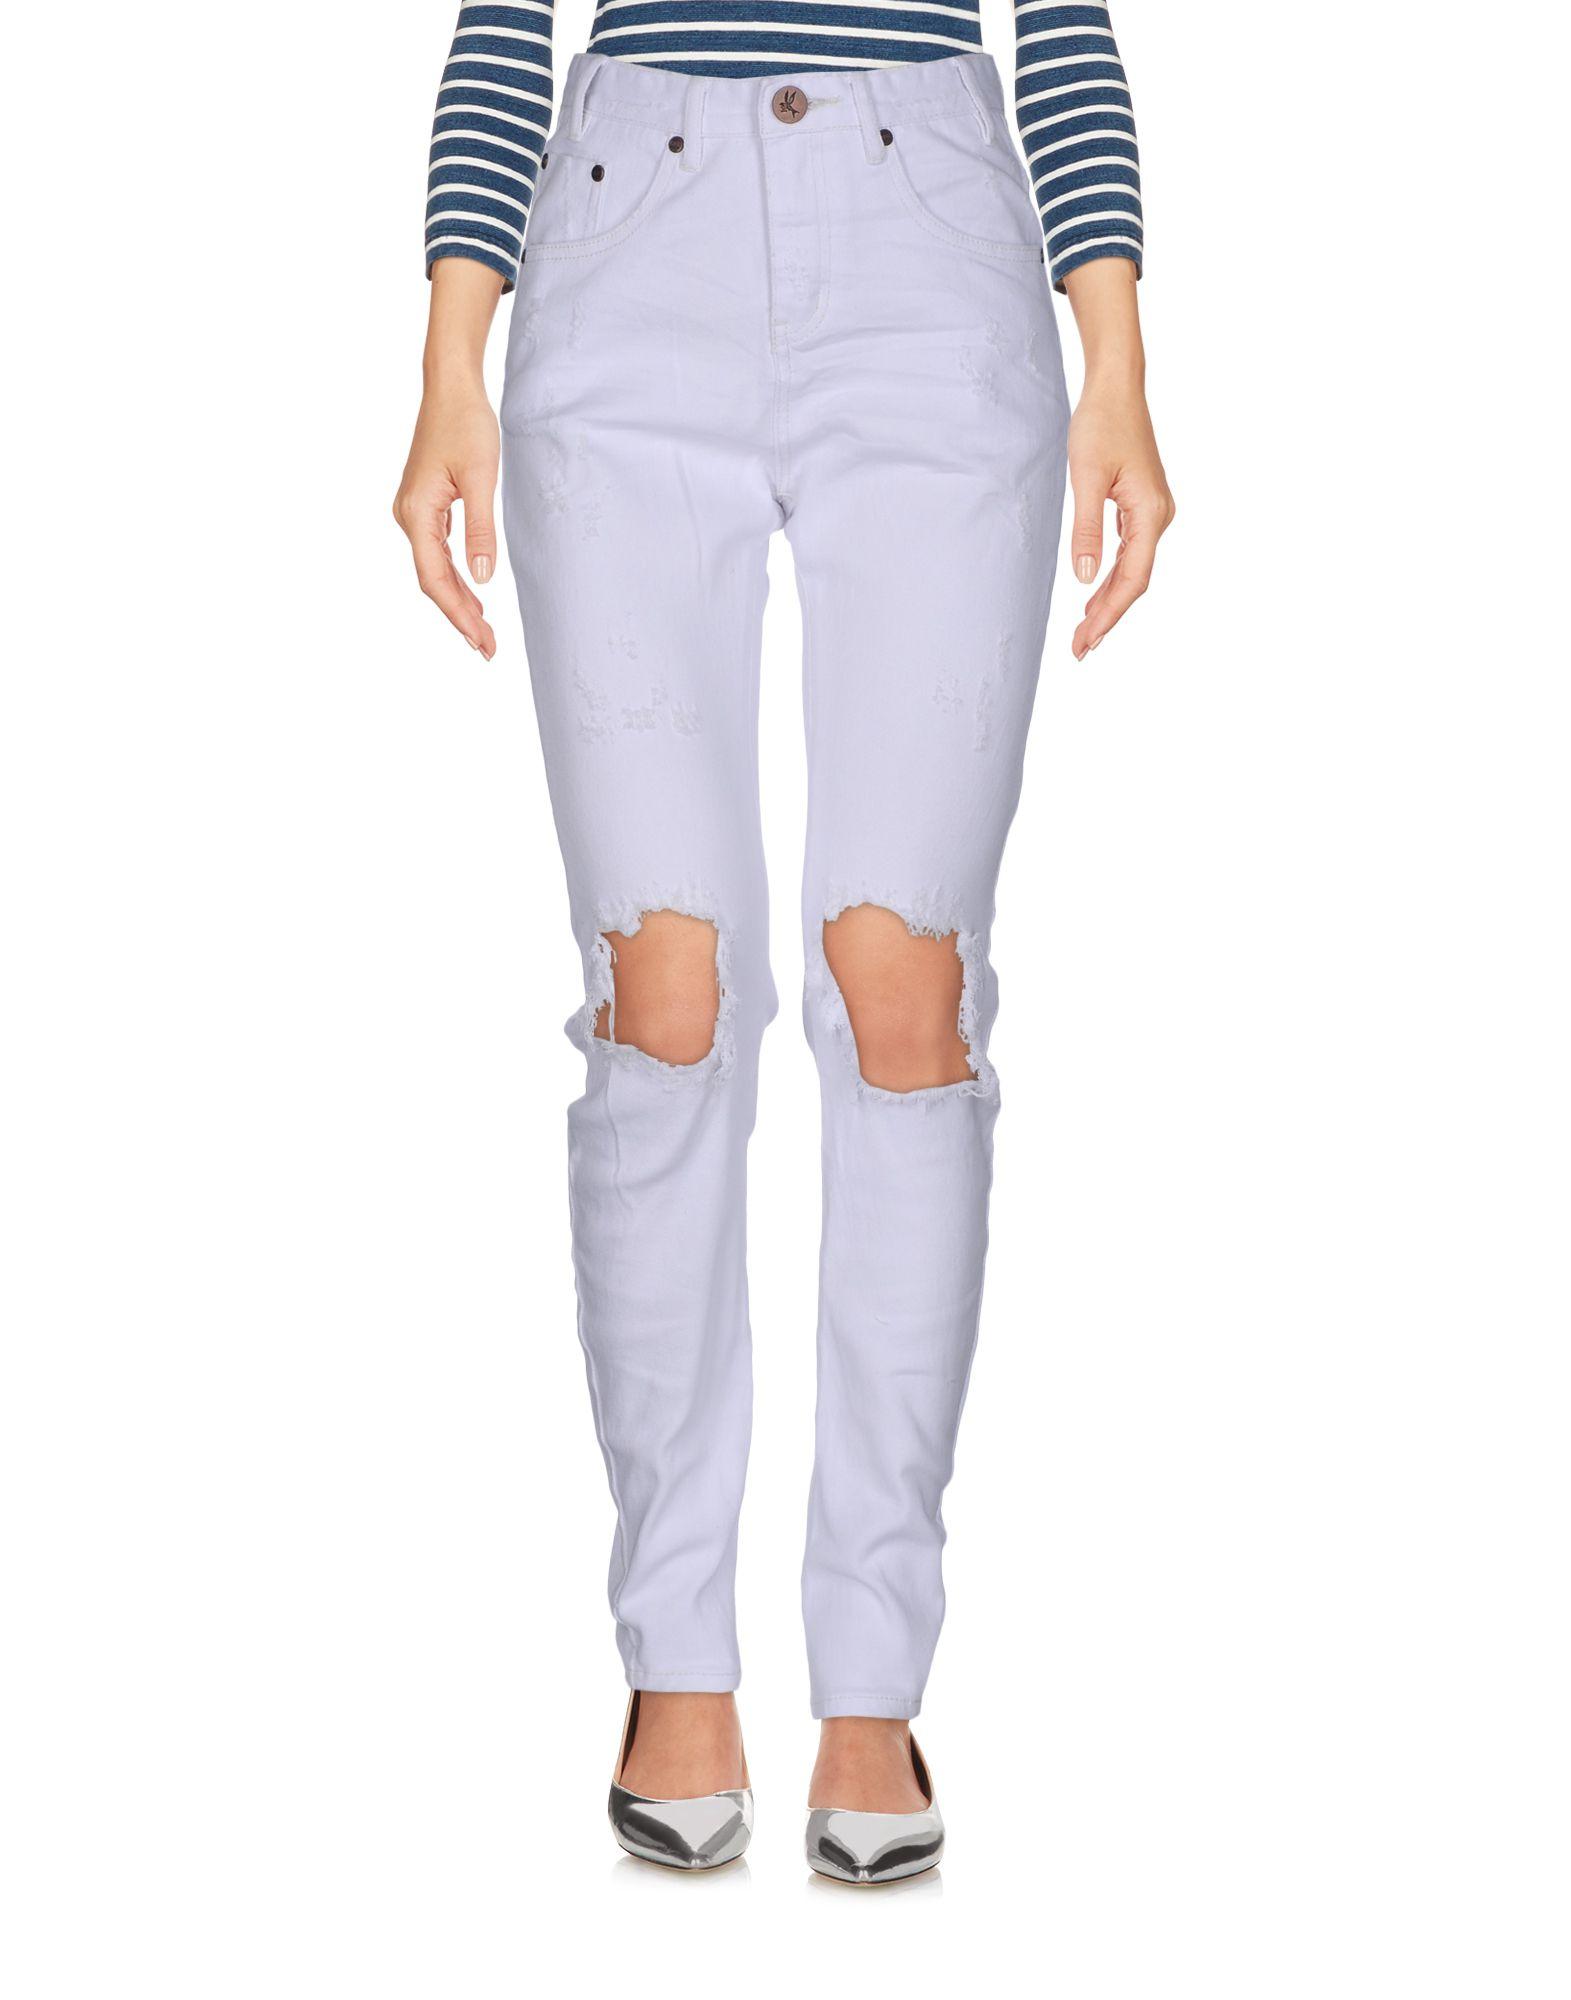 ФОТО one x oneteaspoon джинсовые брюки